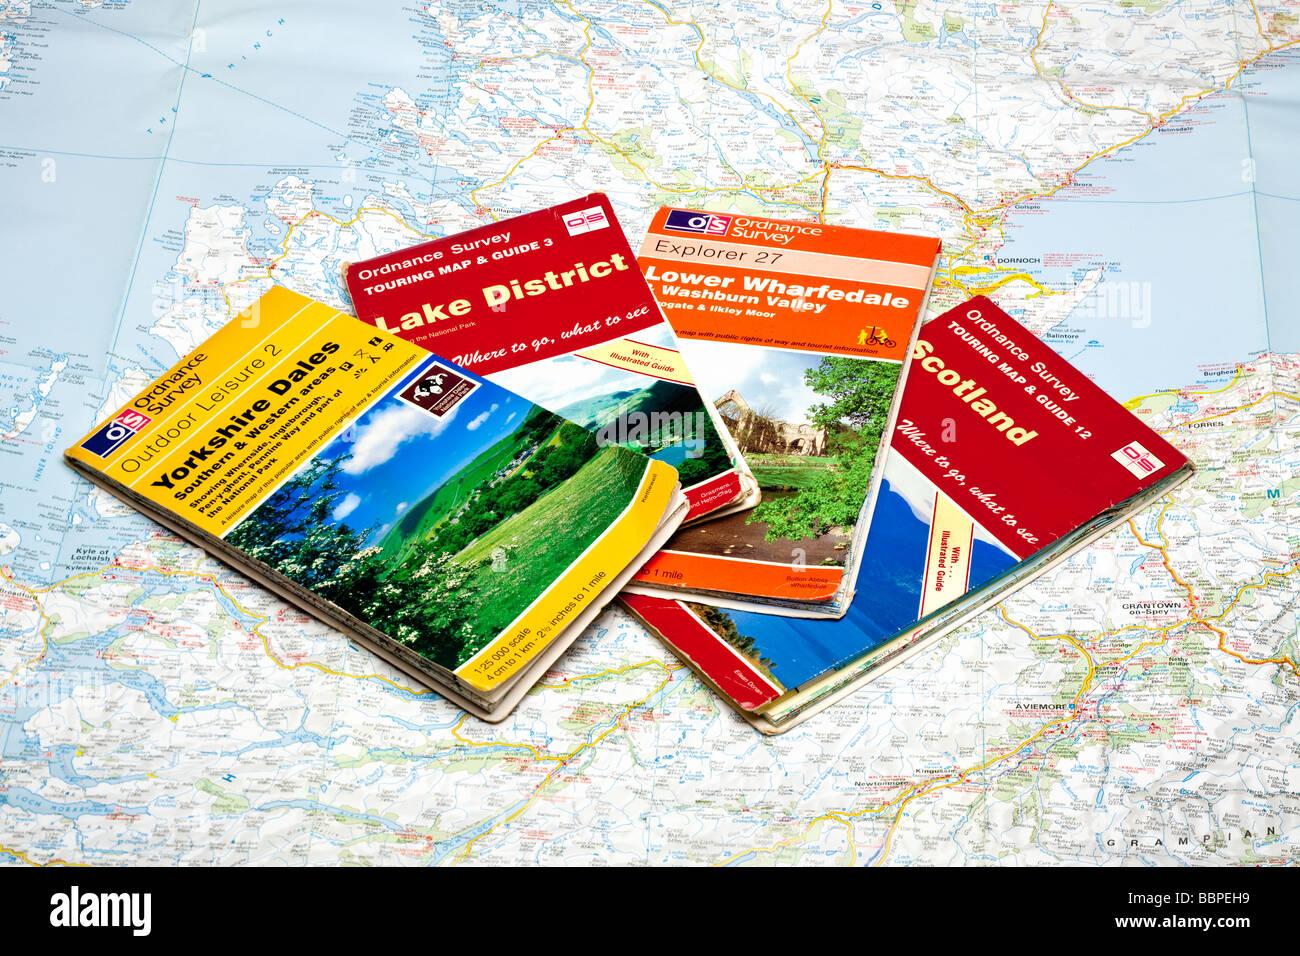 Set of four Ordnance Surveys maps on a map of Scotland - Stock Image